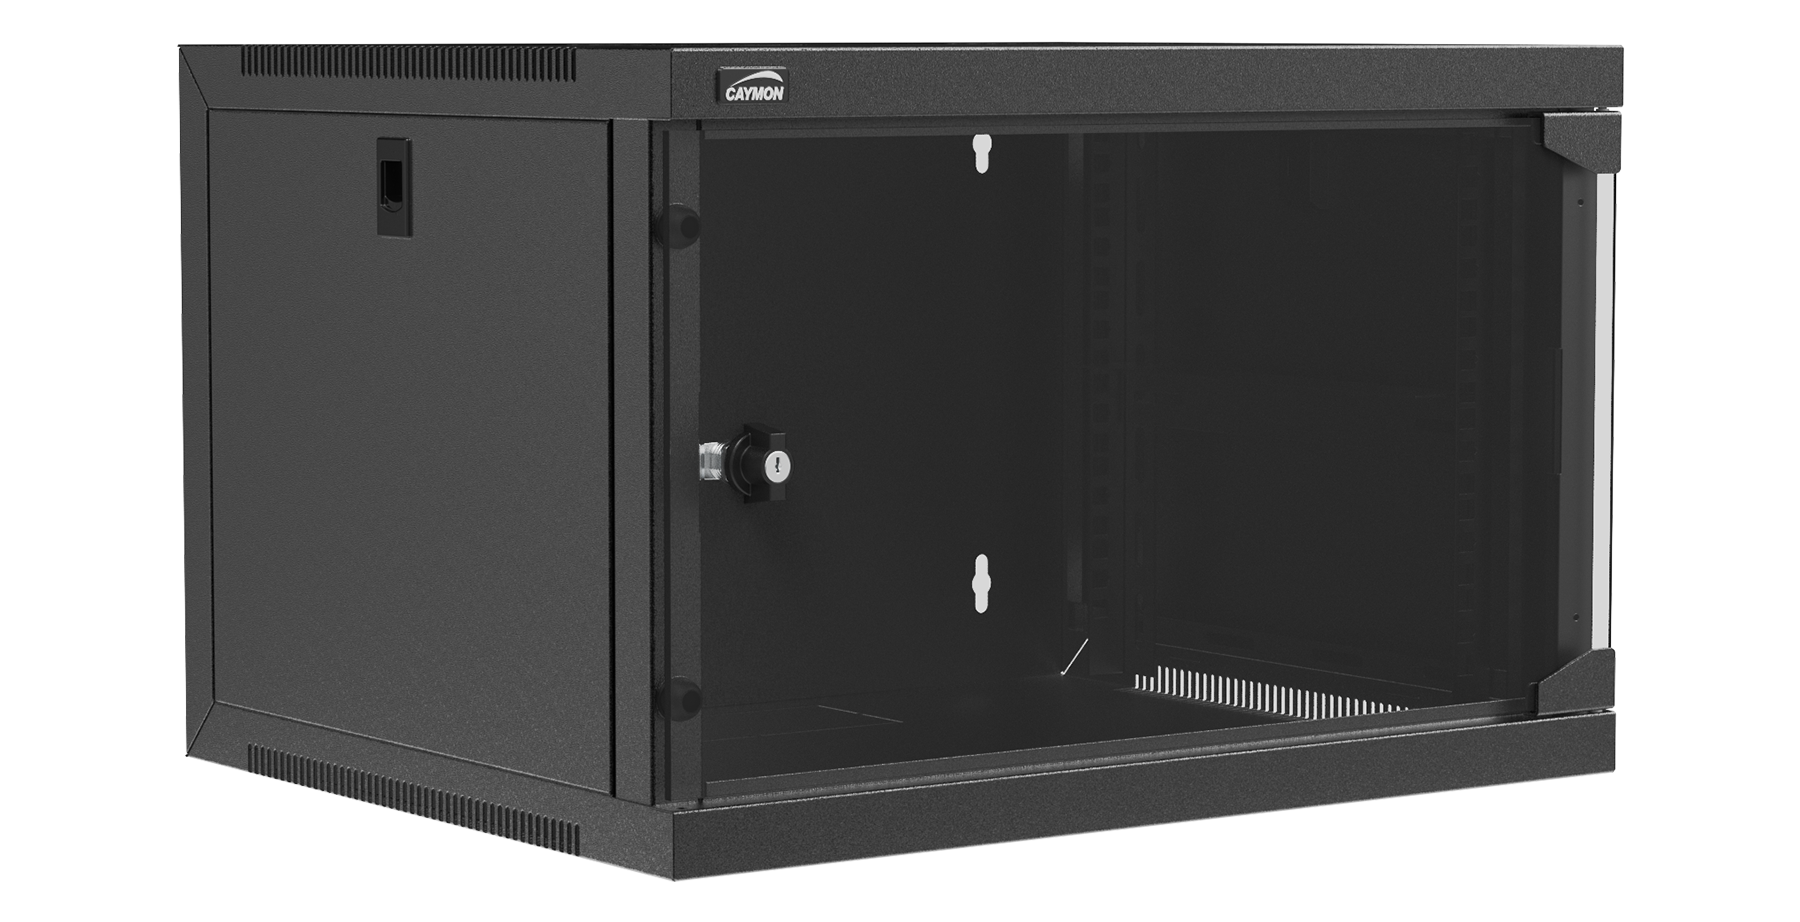 "EPR406 - 19"" wall rack - 6 units - 450 mm depth"